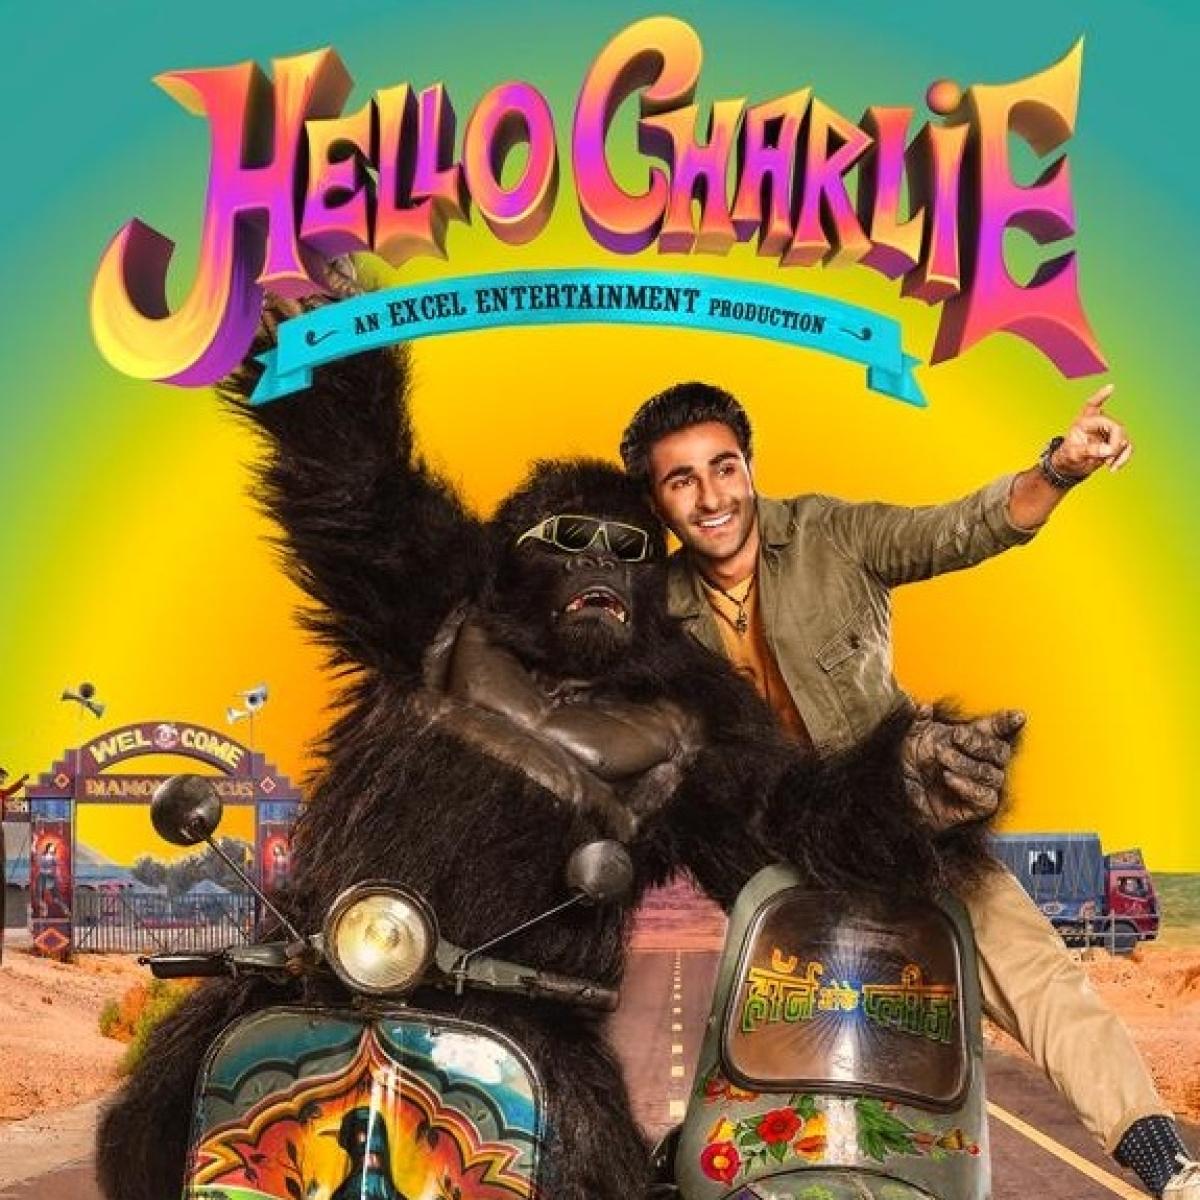 Aadar Jain's 'Hello Charlie' to release on Amazon Prime Video on April 9